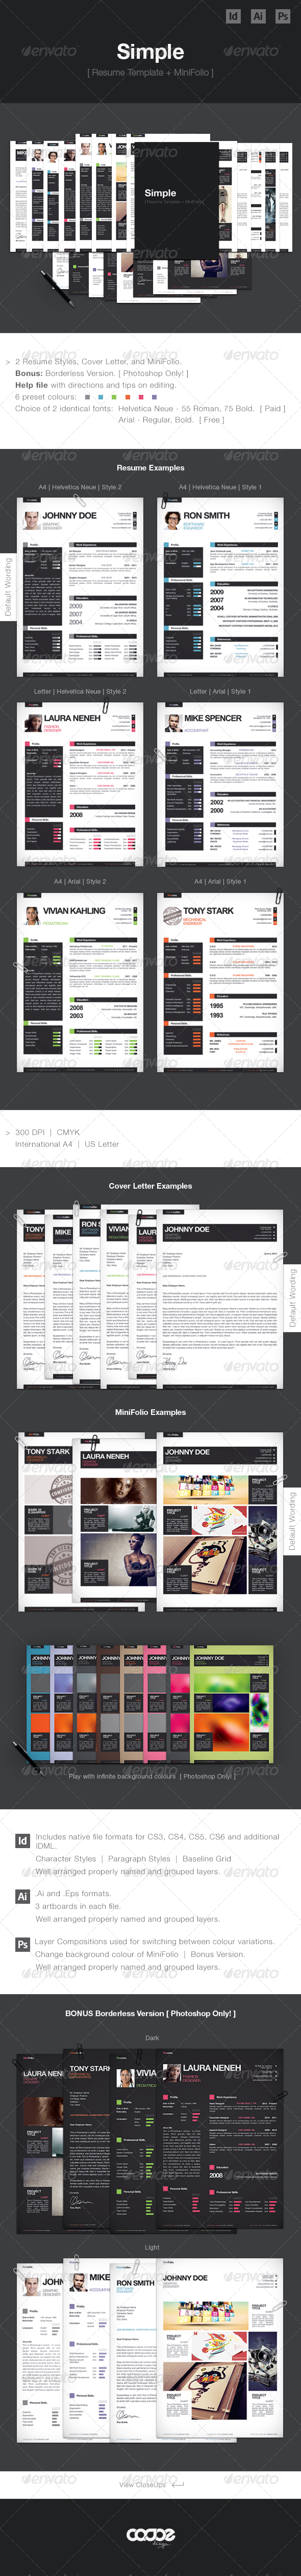 GraphicRiver Simple Resume CV Template & Mini Portfolio 4678185